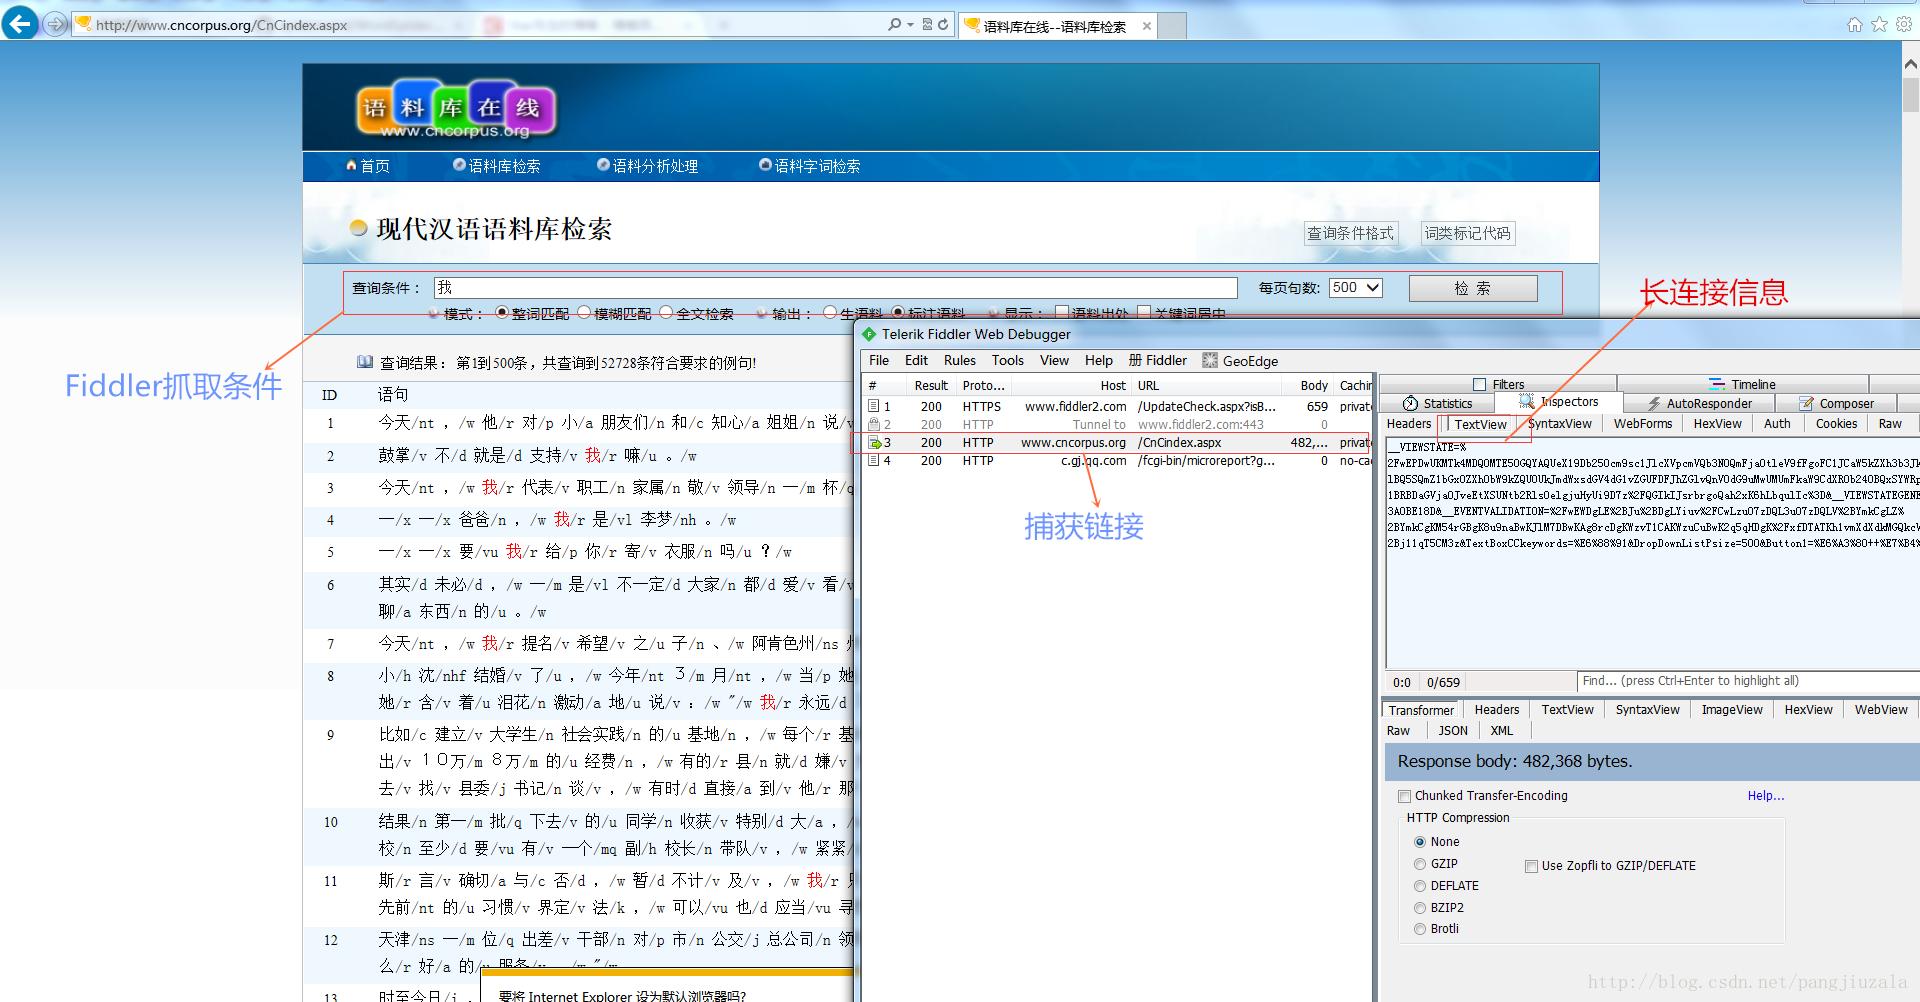 Fiddler + JSoup 爬取现代汉语语料库数据